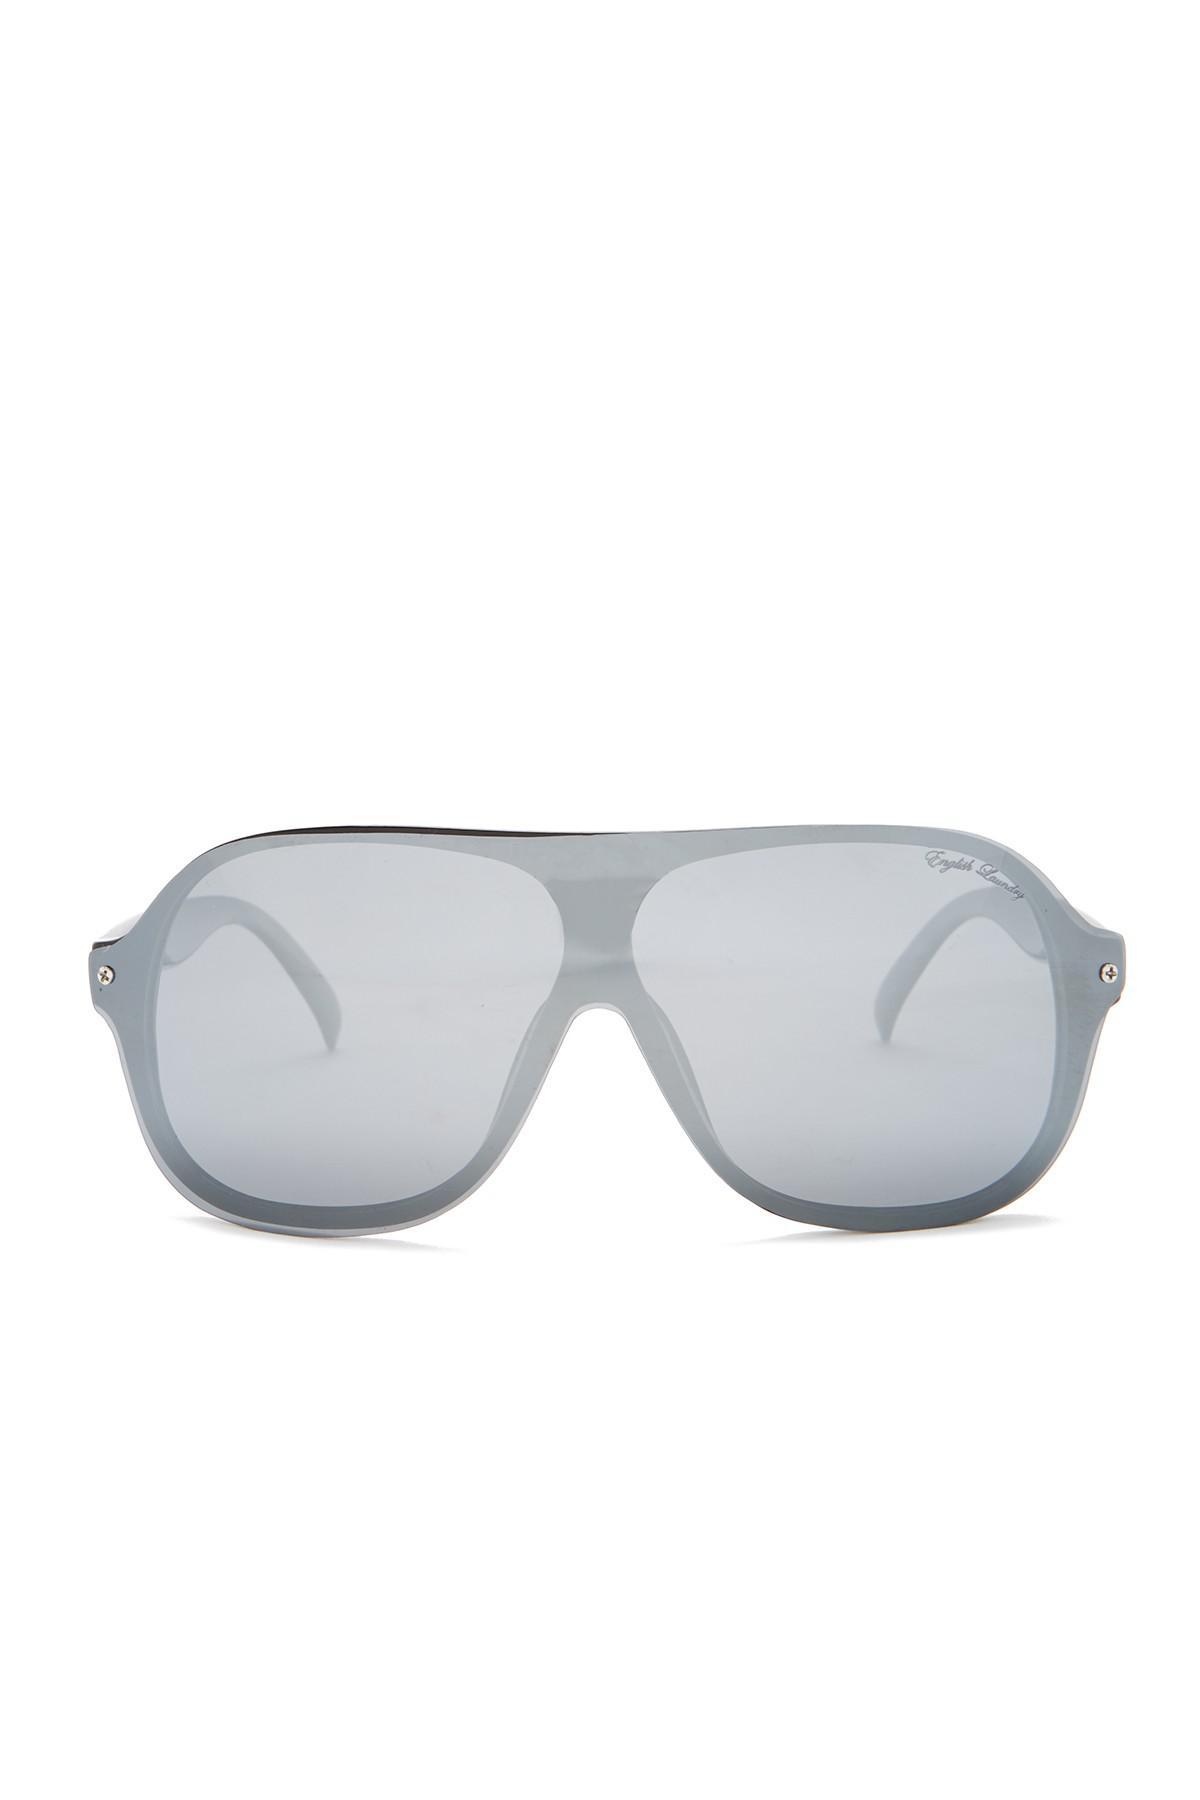 67229f22a746 English Laundry Shield Plastic Frame Sunglasses for Men - Lyst